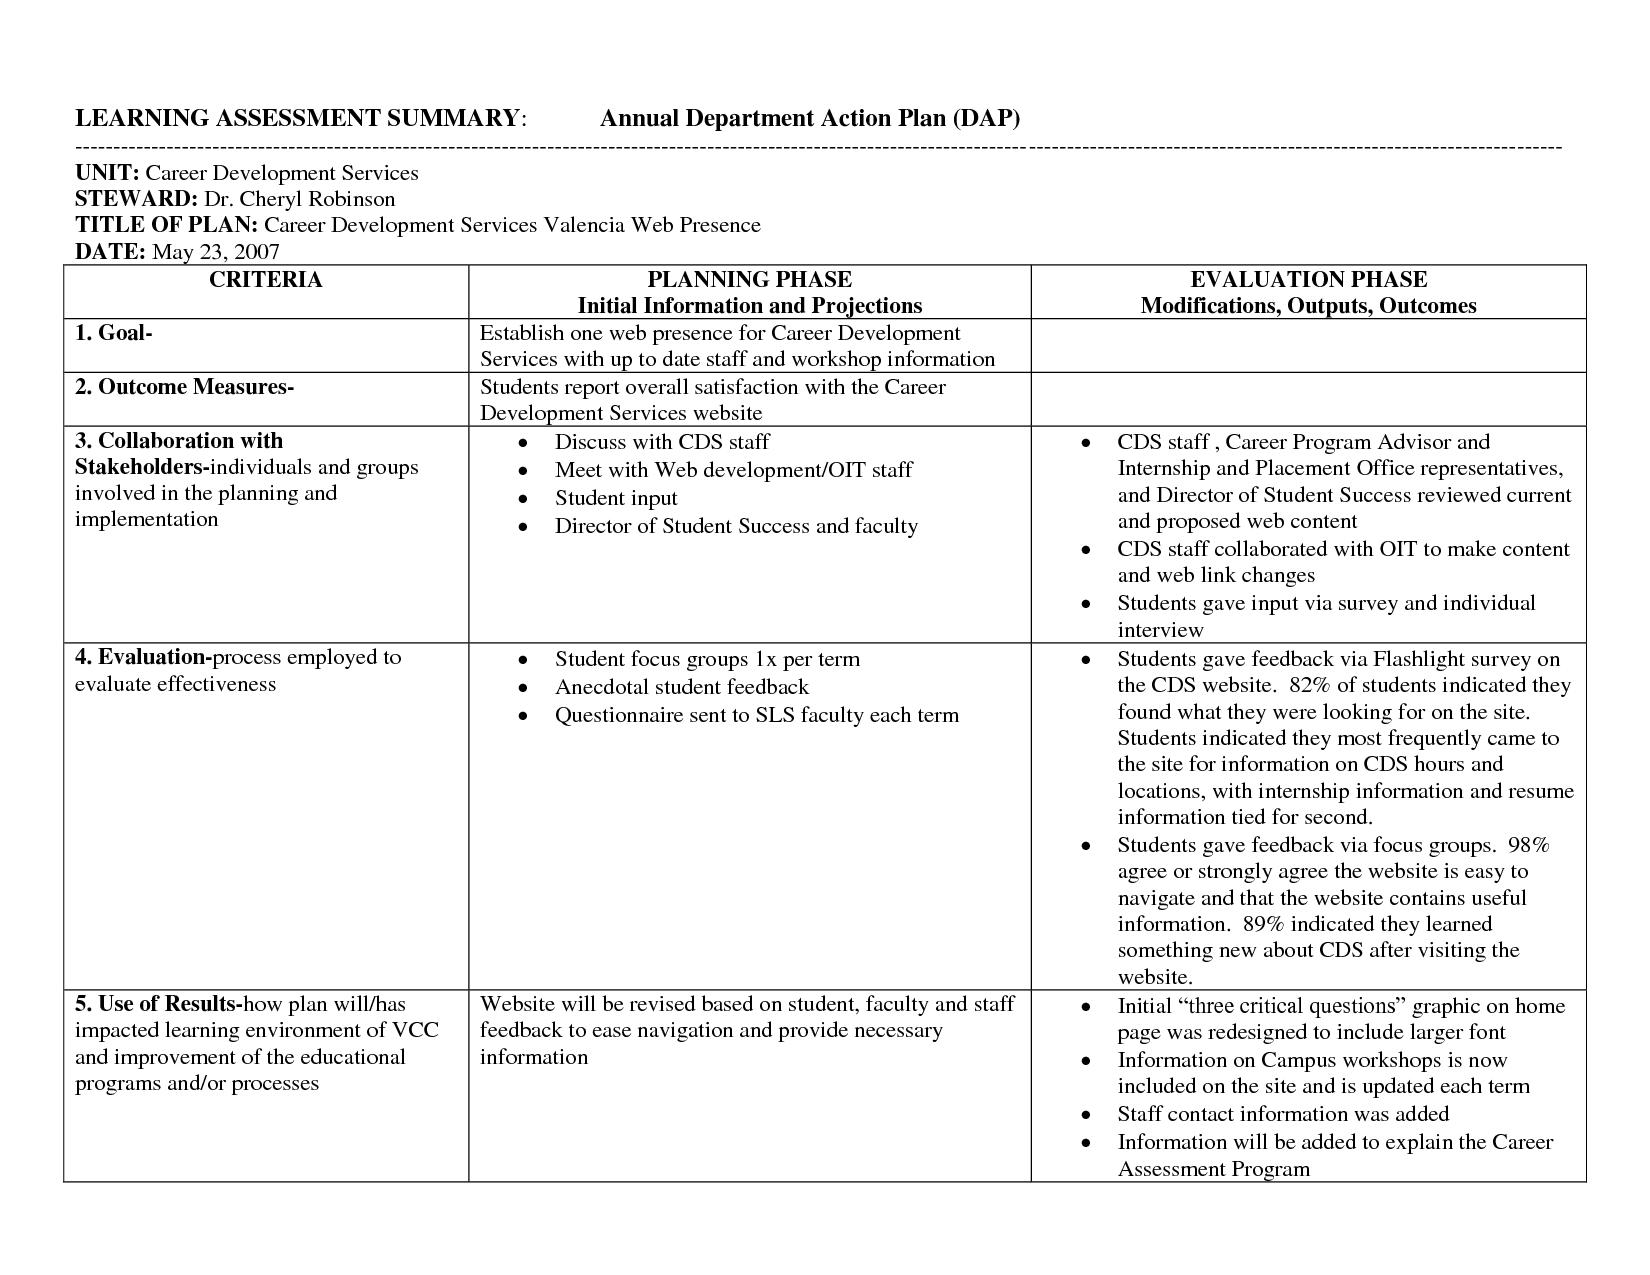 Career Services Department Action Plan Template Assessmnet